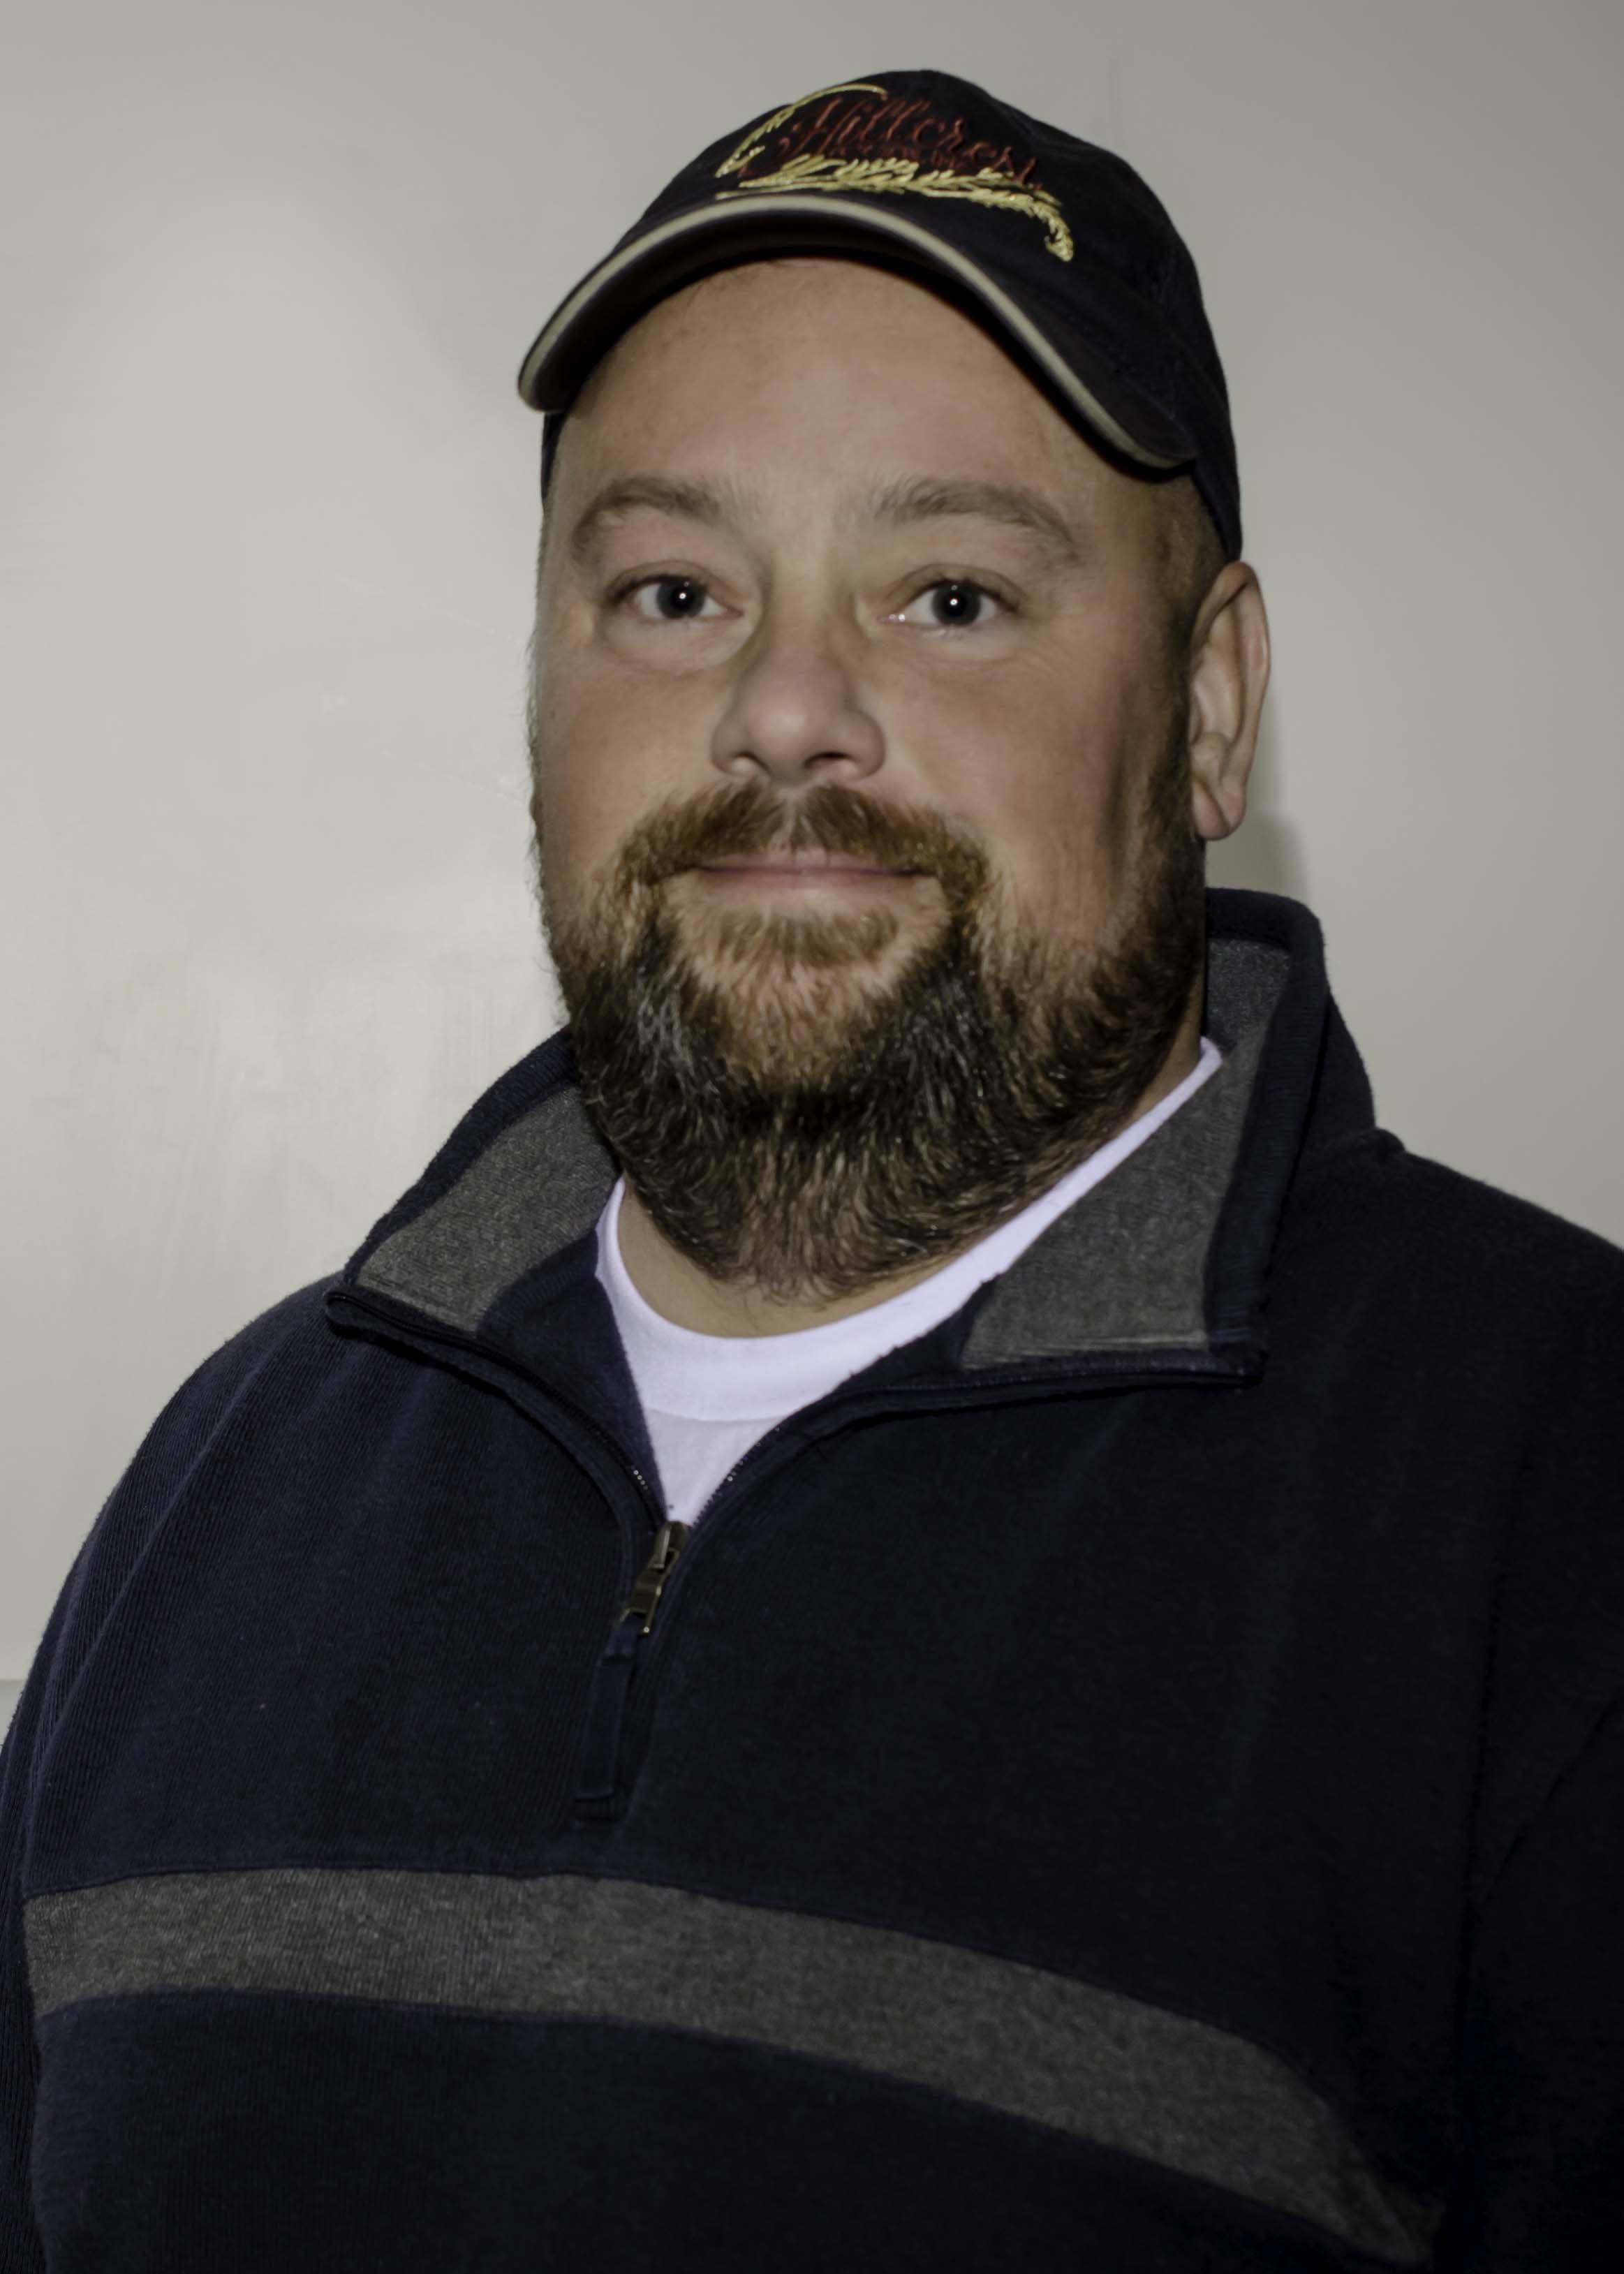 Steve Deuso